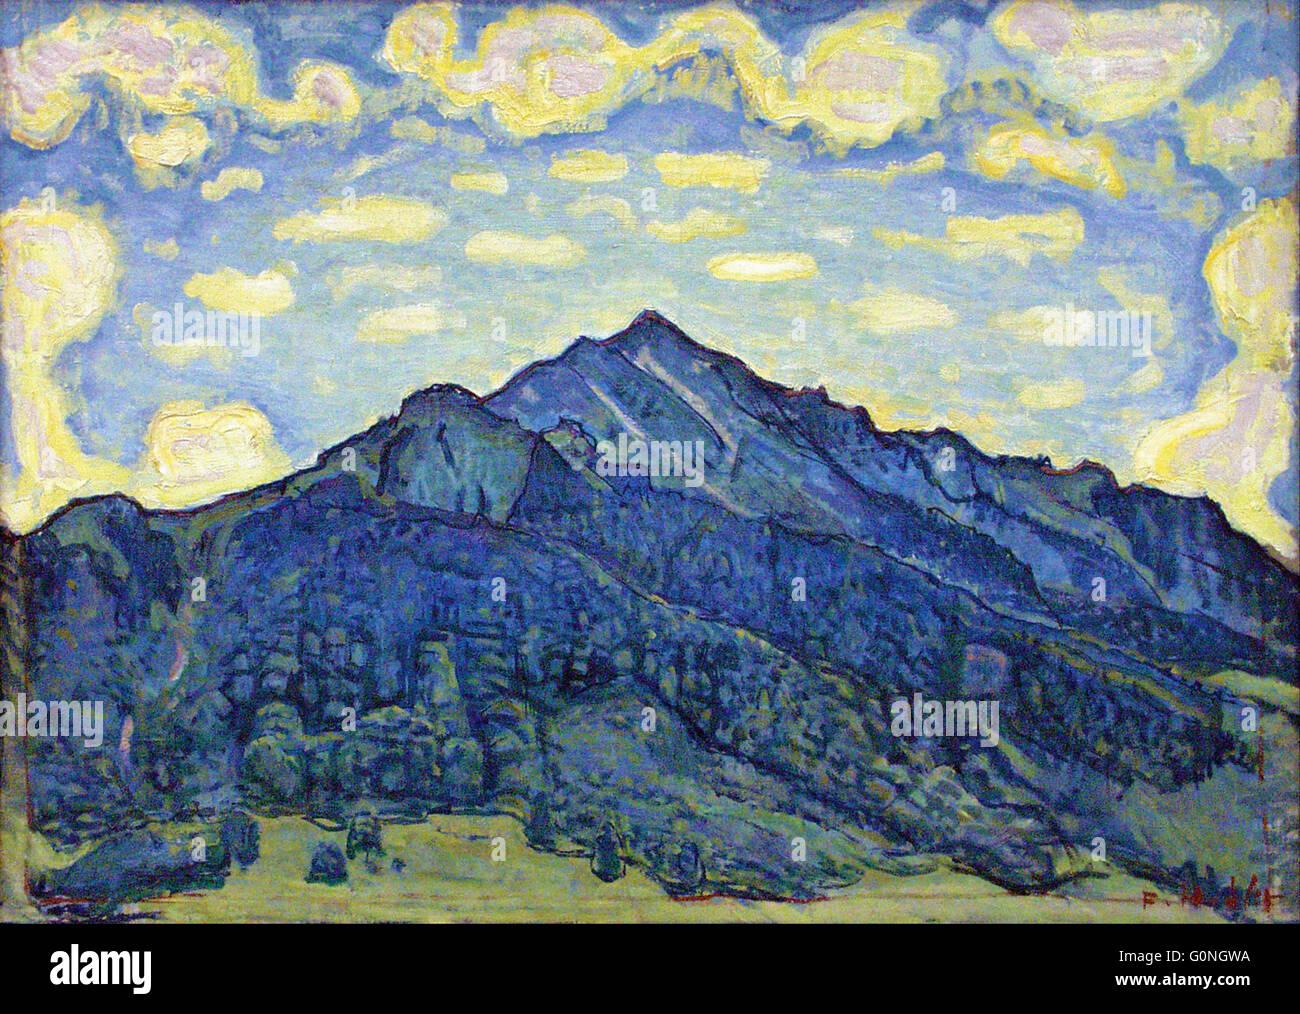 Ferdinand Hodler - Landschaft in den Schweizer Alpen - Stock Image